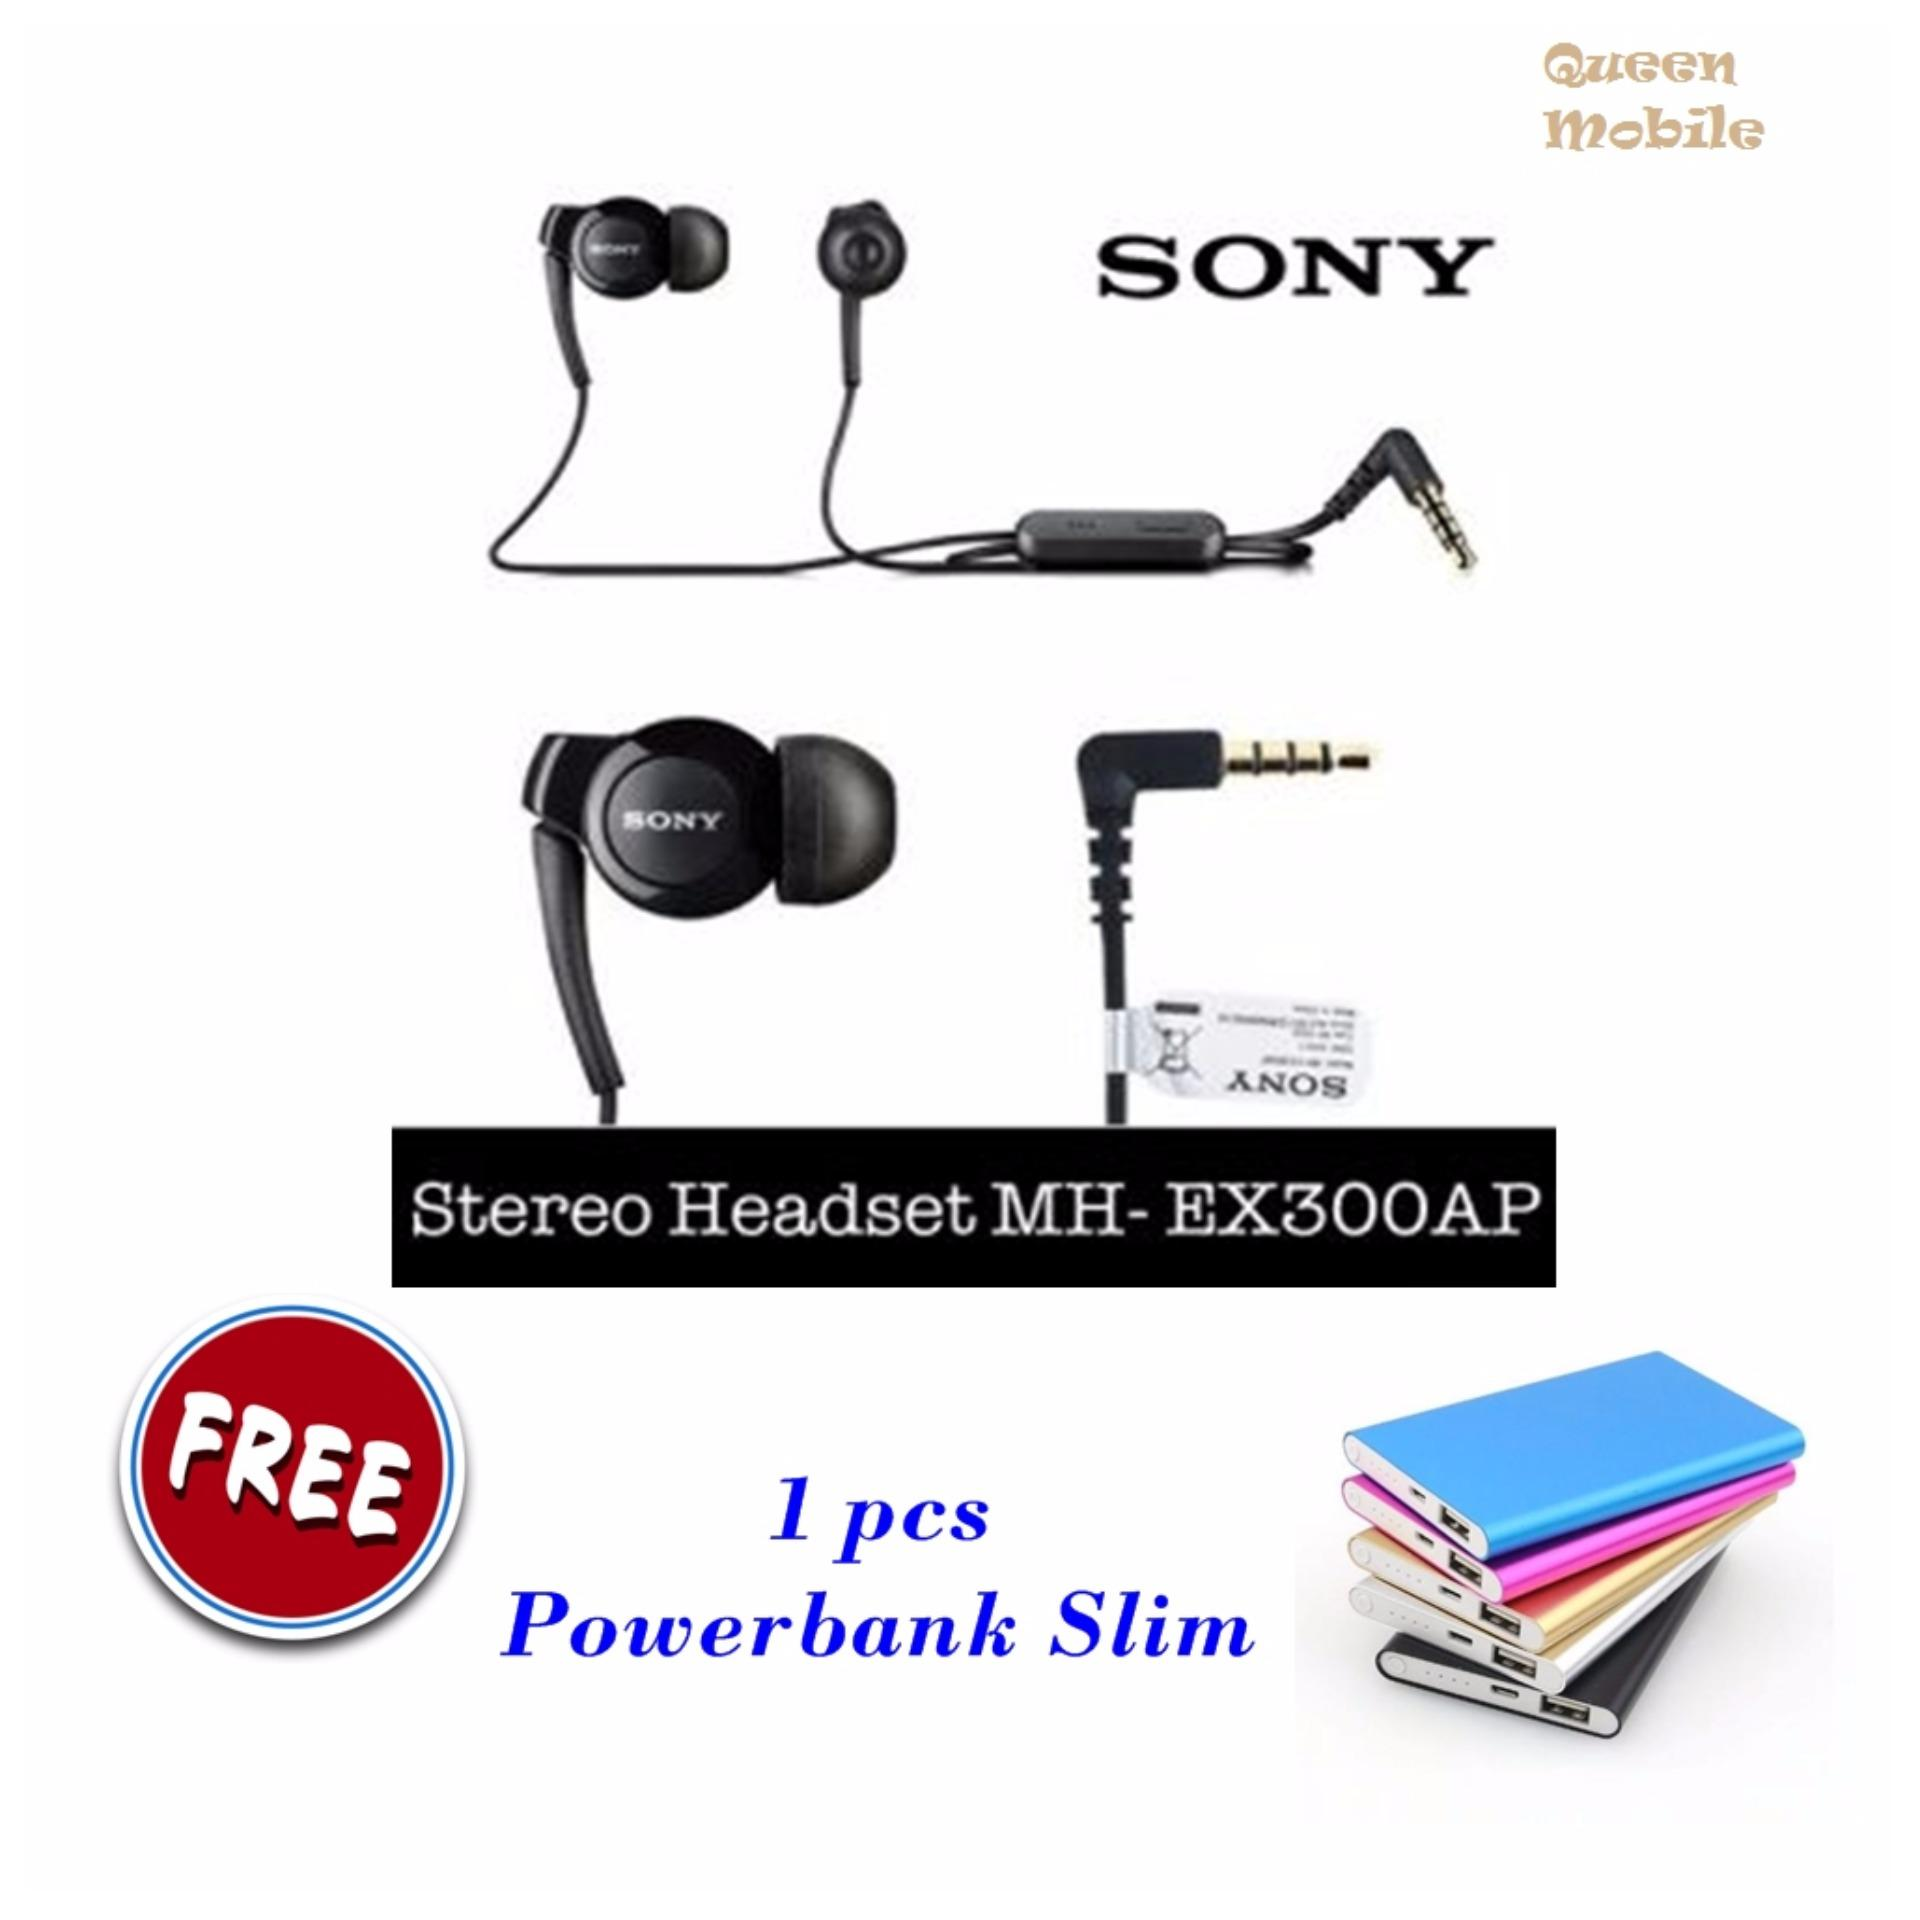 Promo Sony Stereo Headset Mdr 700Ap Powerbank Slim Dki Jakarta